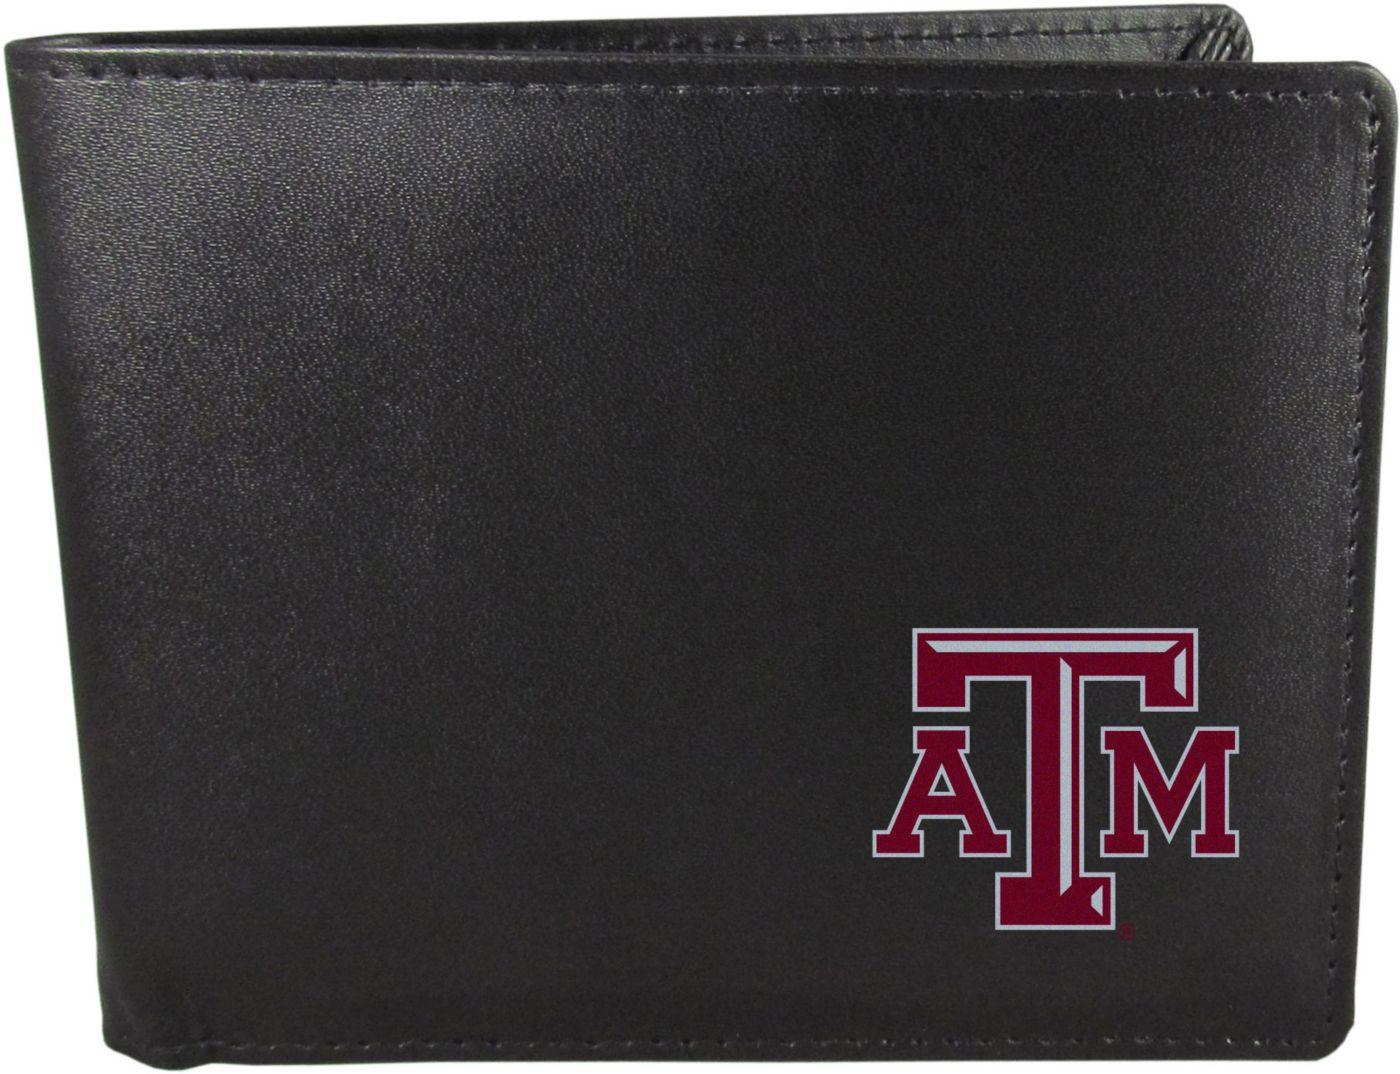 Texas A&M Aggies Bi-Fold Wallet